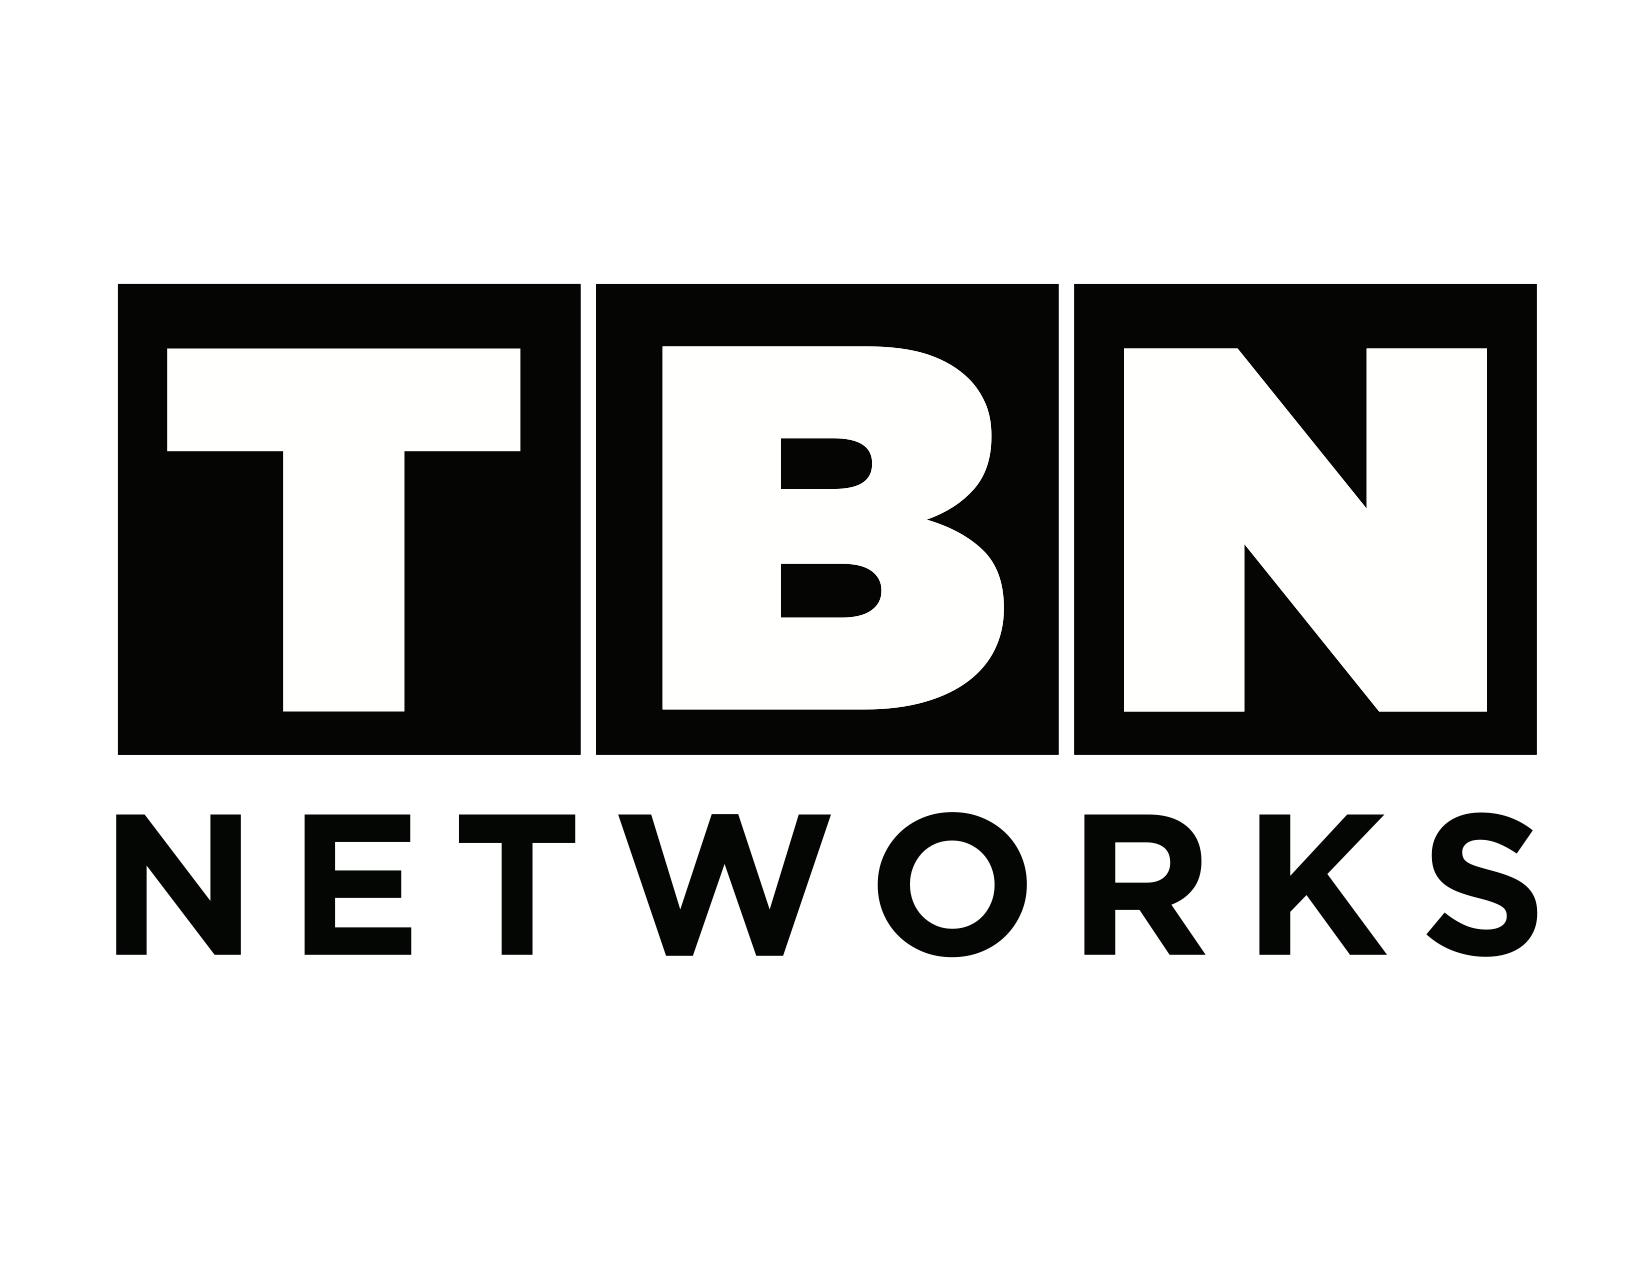 TBN Networks Black and White Logo